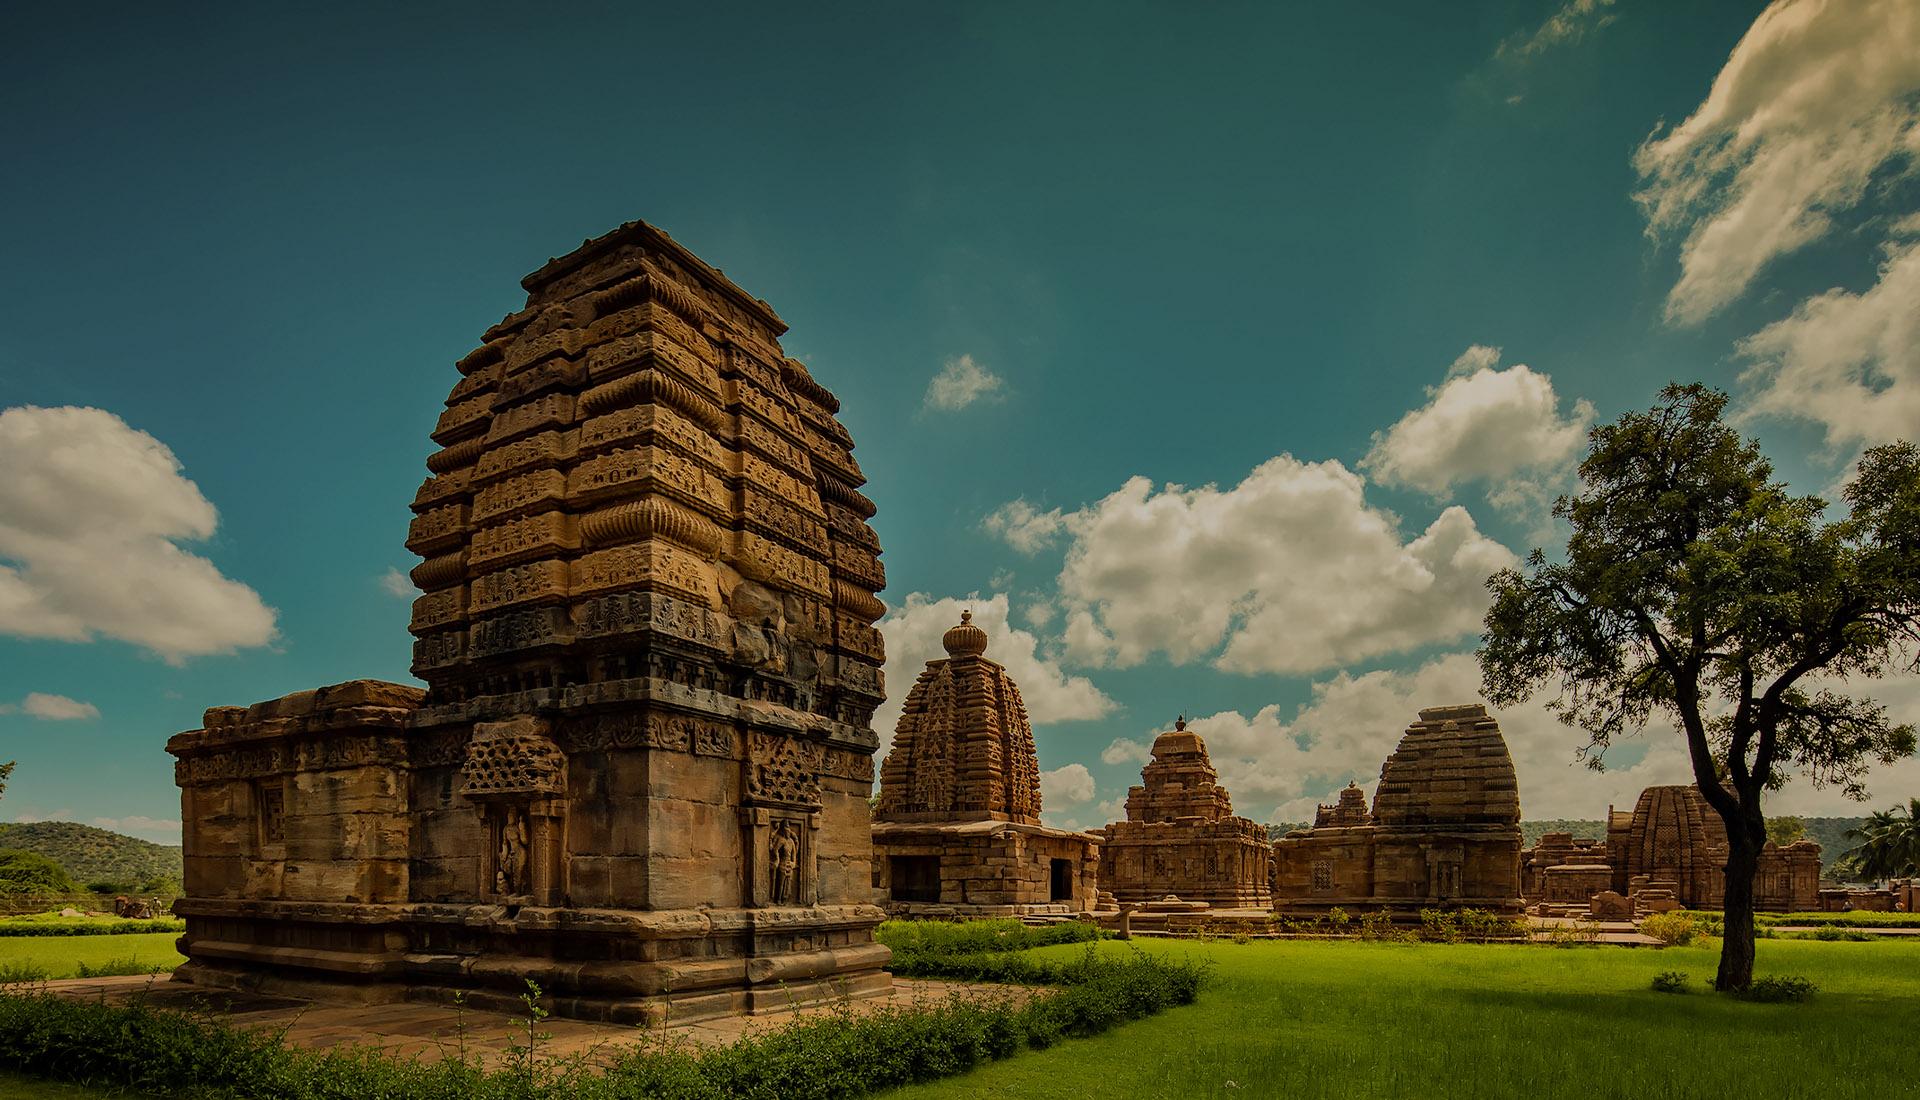 Pattadakal Group of Monuments